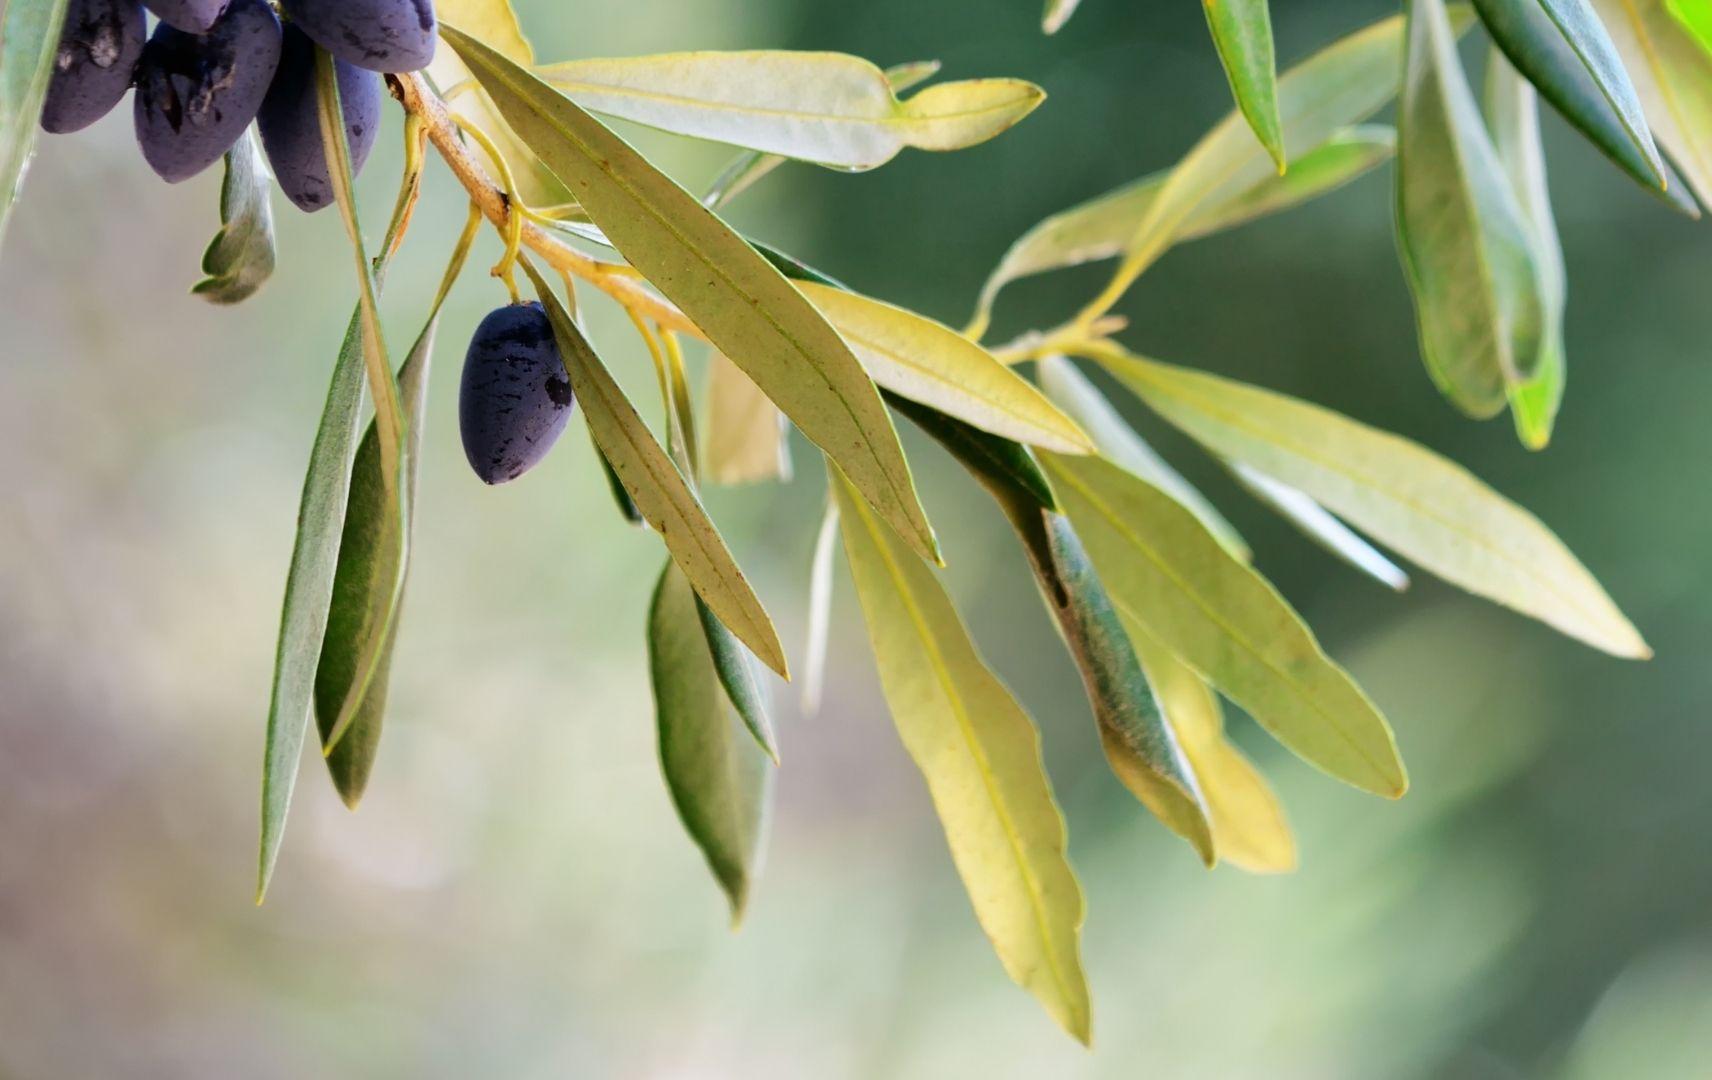 Olivenbaum - Blatt mit Olive